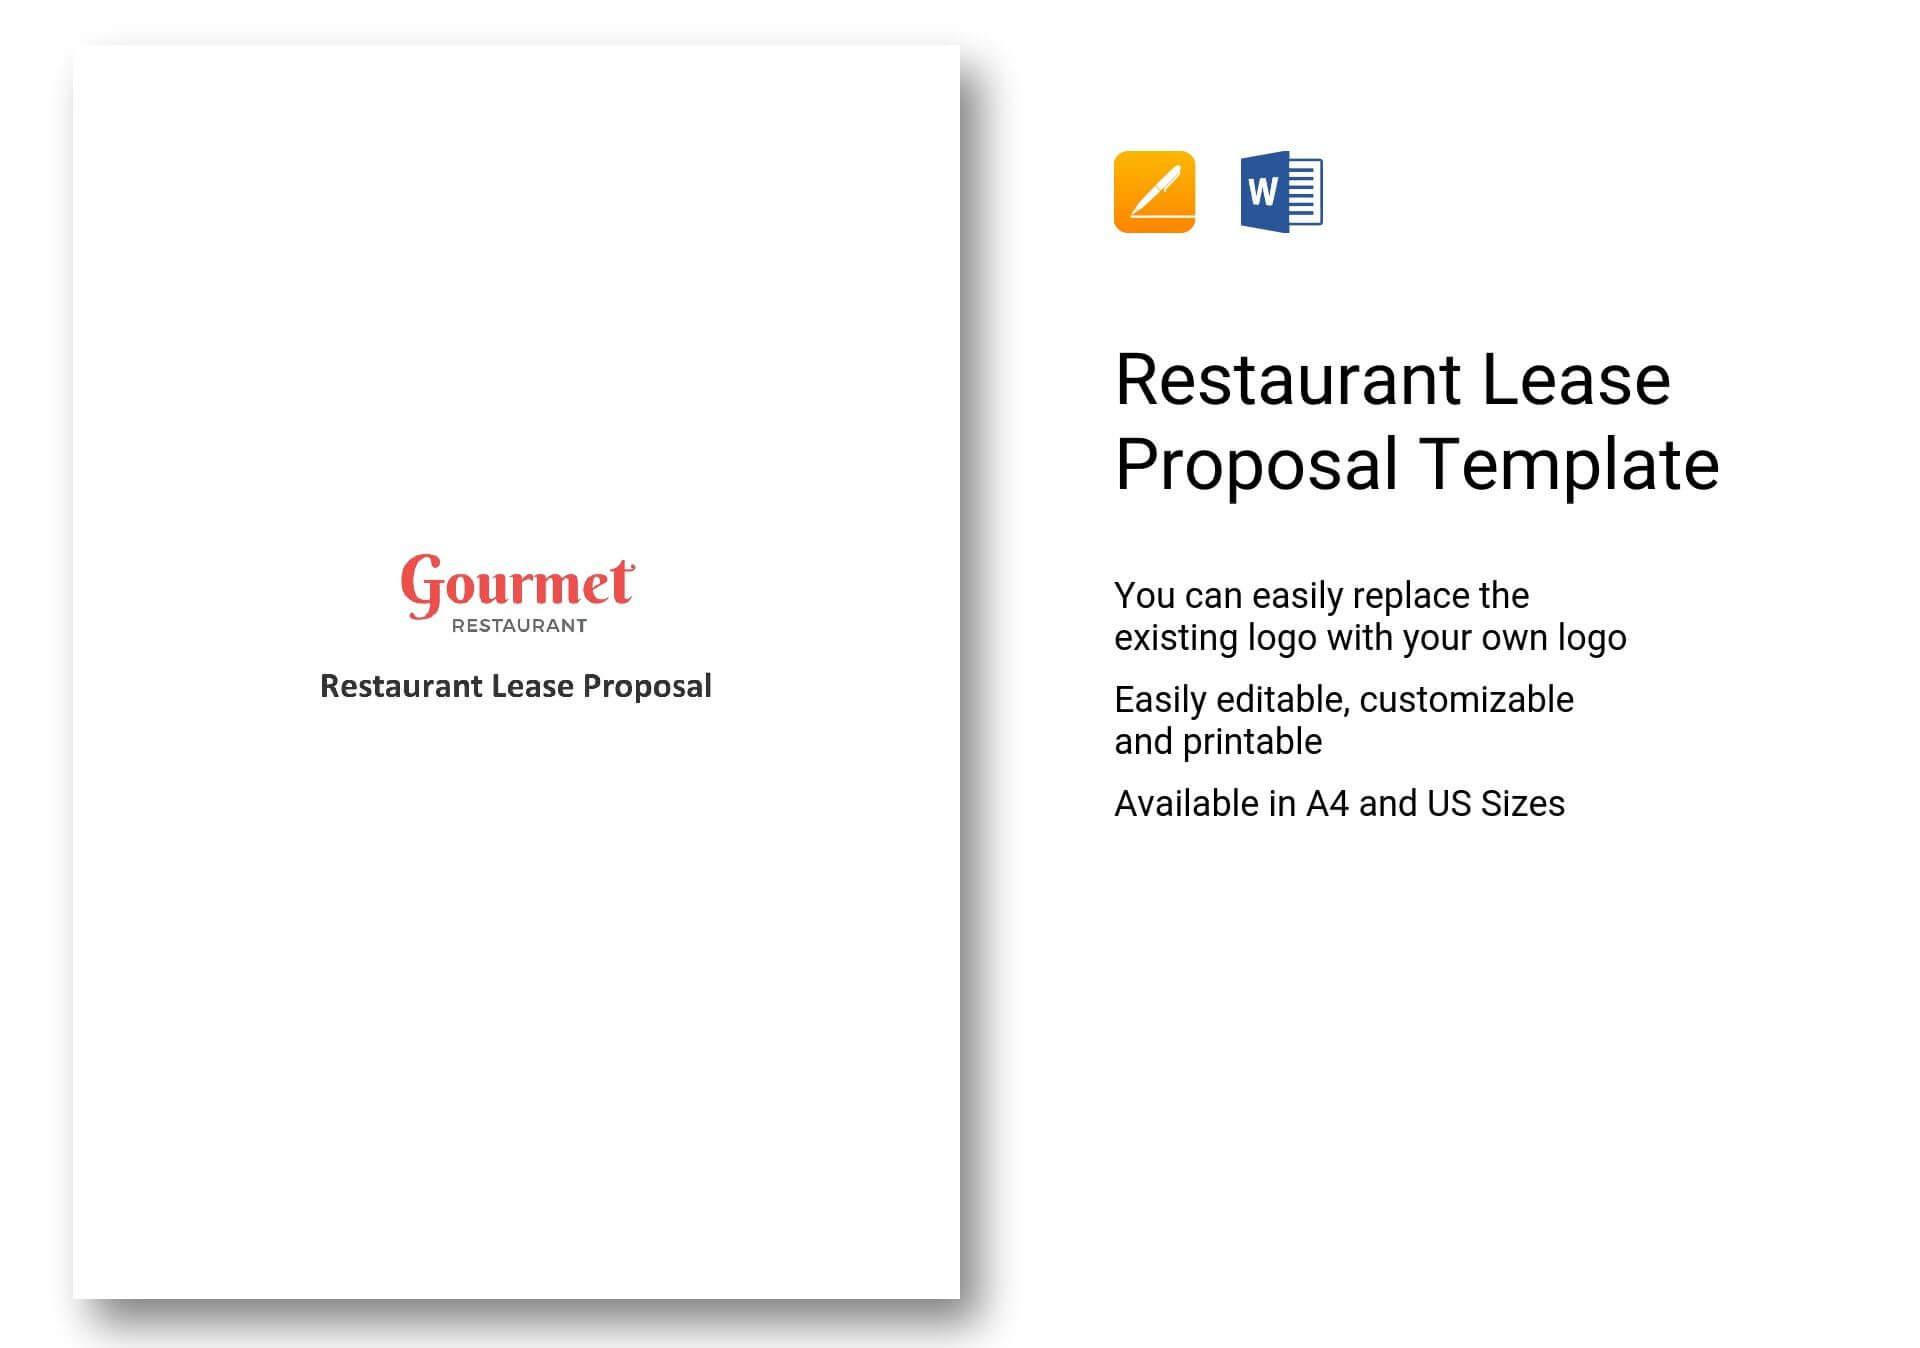 Lease Business Proposal Template Plan Rental Uk | Rainbow9 For Business Lease Proposal Template